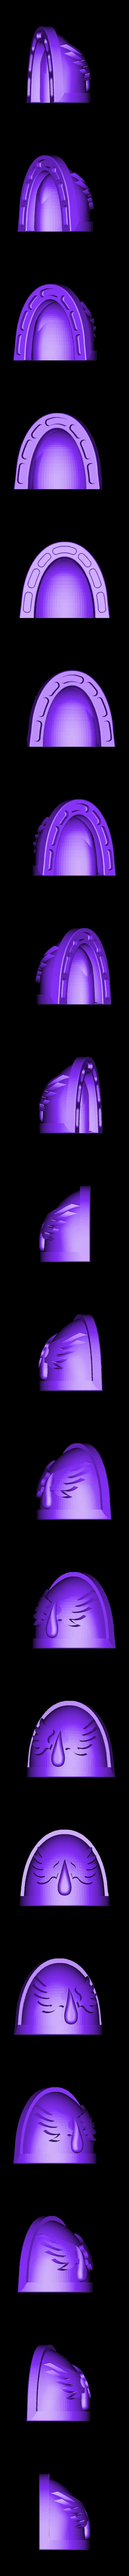 Shoulder_Pad_-_Winged_Opals.stl Download free STL file Winged Opals - Marine Upgrade Pack • 3D printer model, GarinC3D